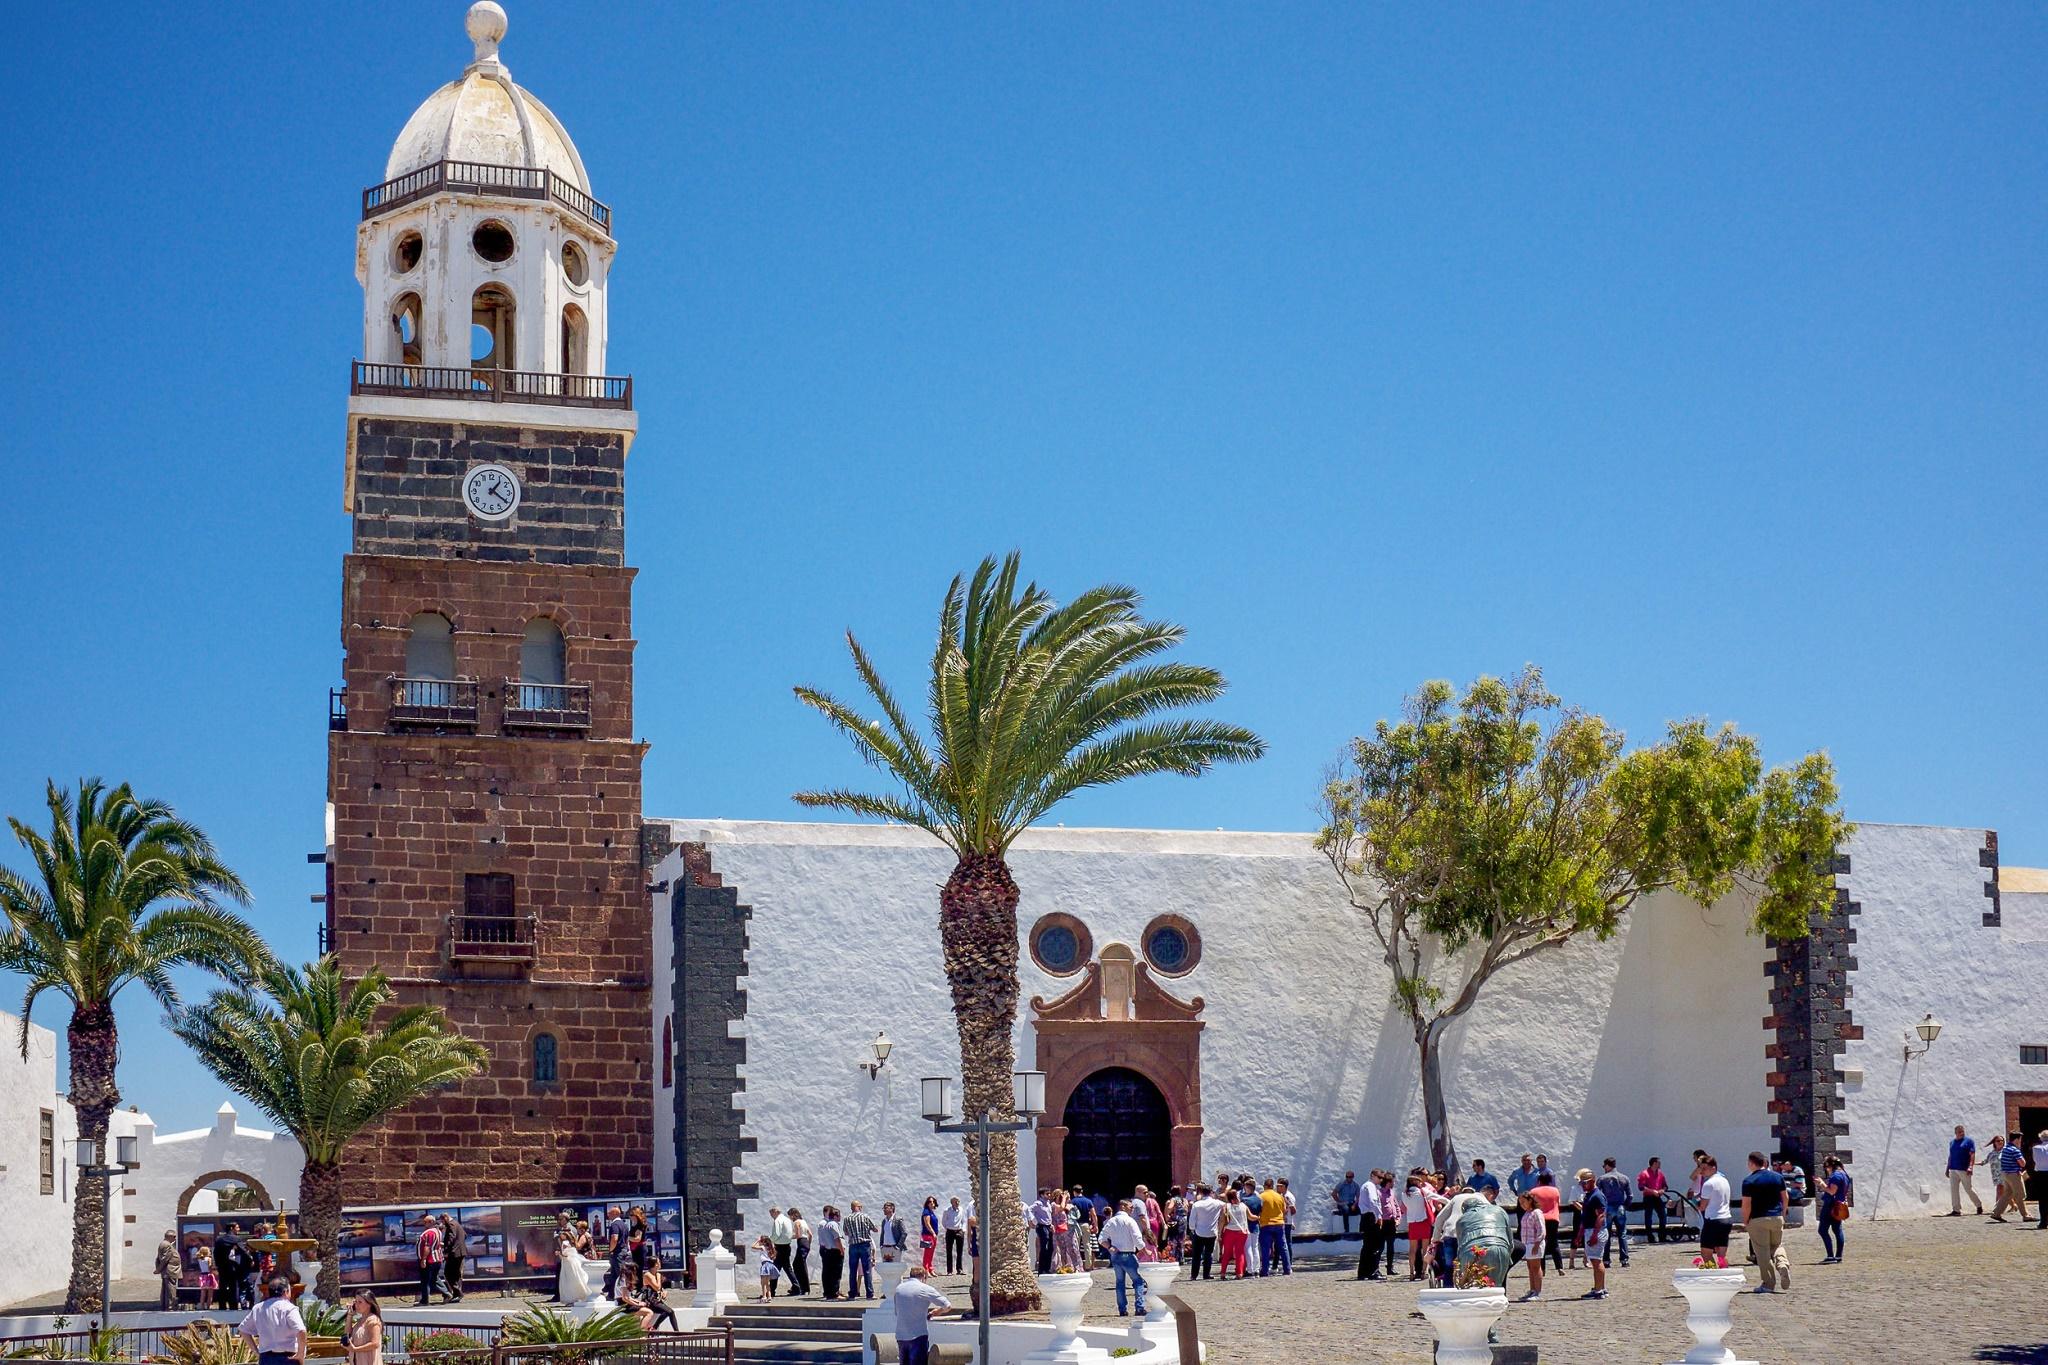 La Iglesia de Guadalupe, Teguise, por Ramón Pérez Niz